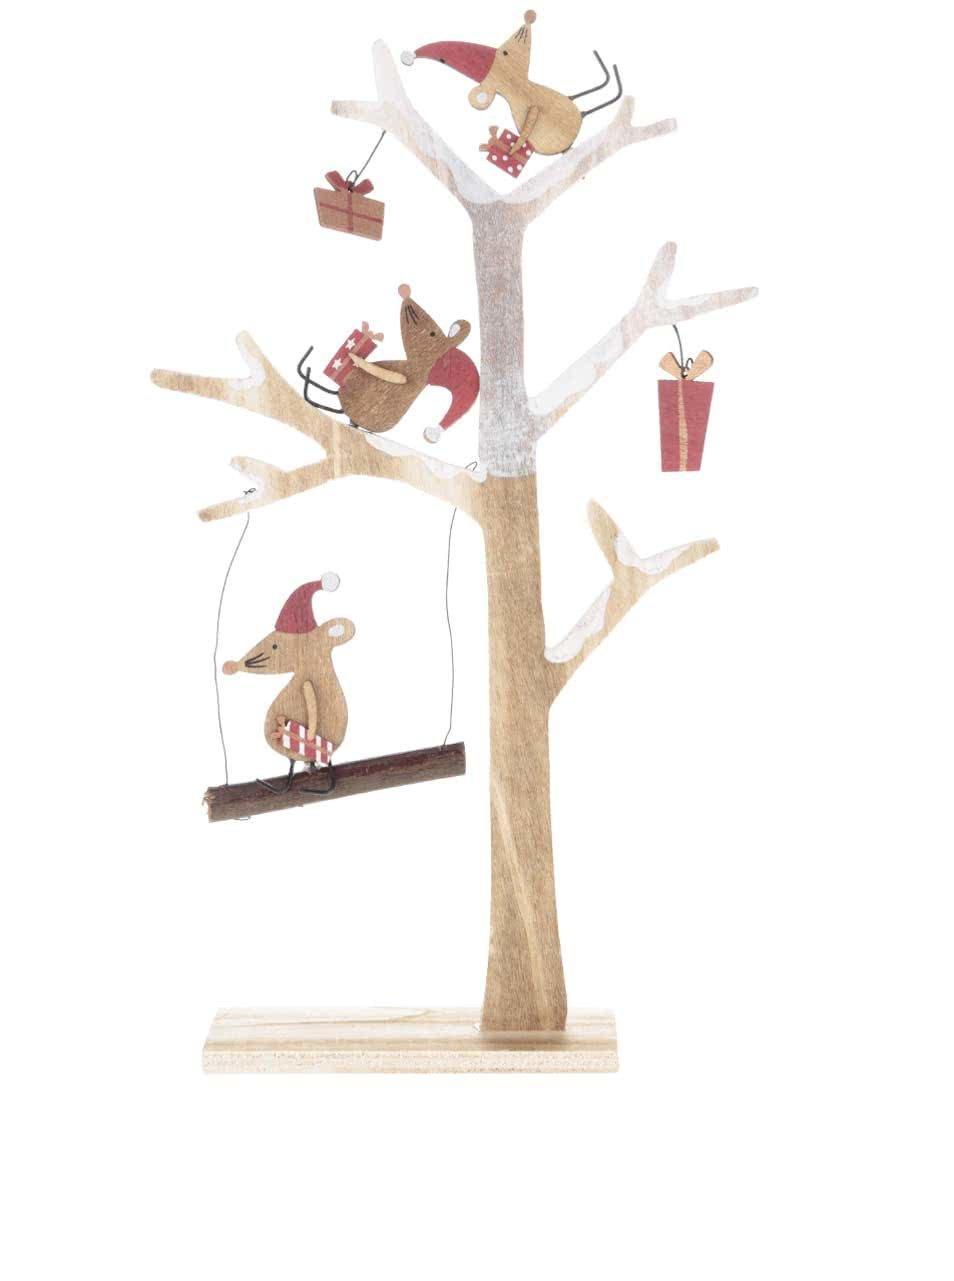 Dřevěná dekorace ve tvaru stromu s myškami Sass & Belle